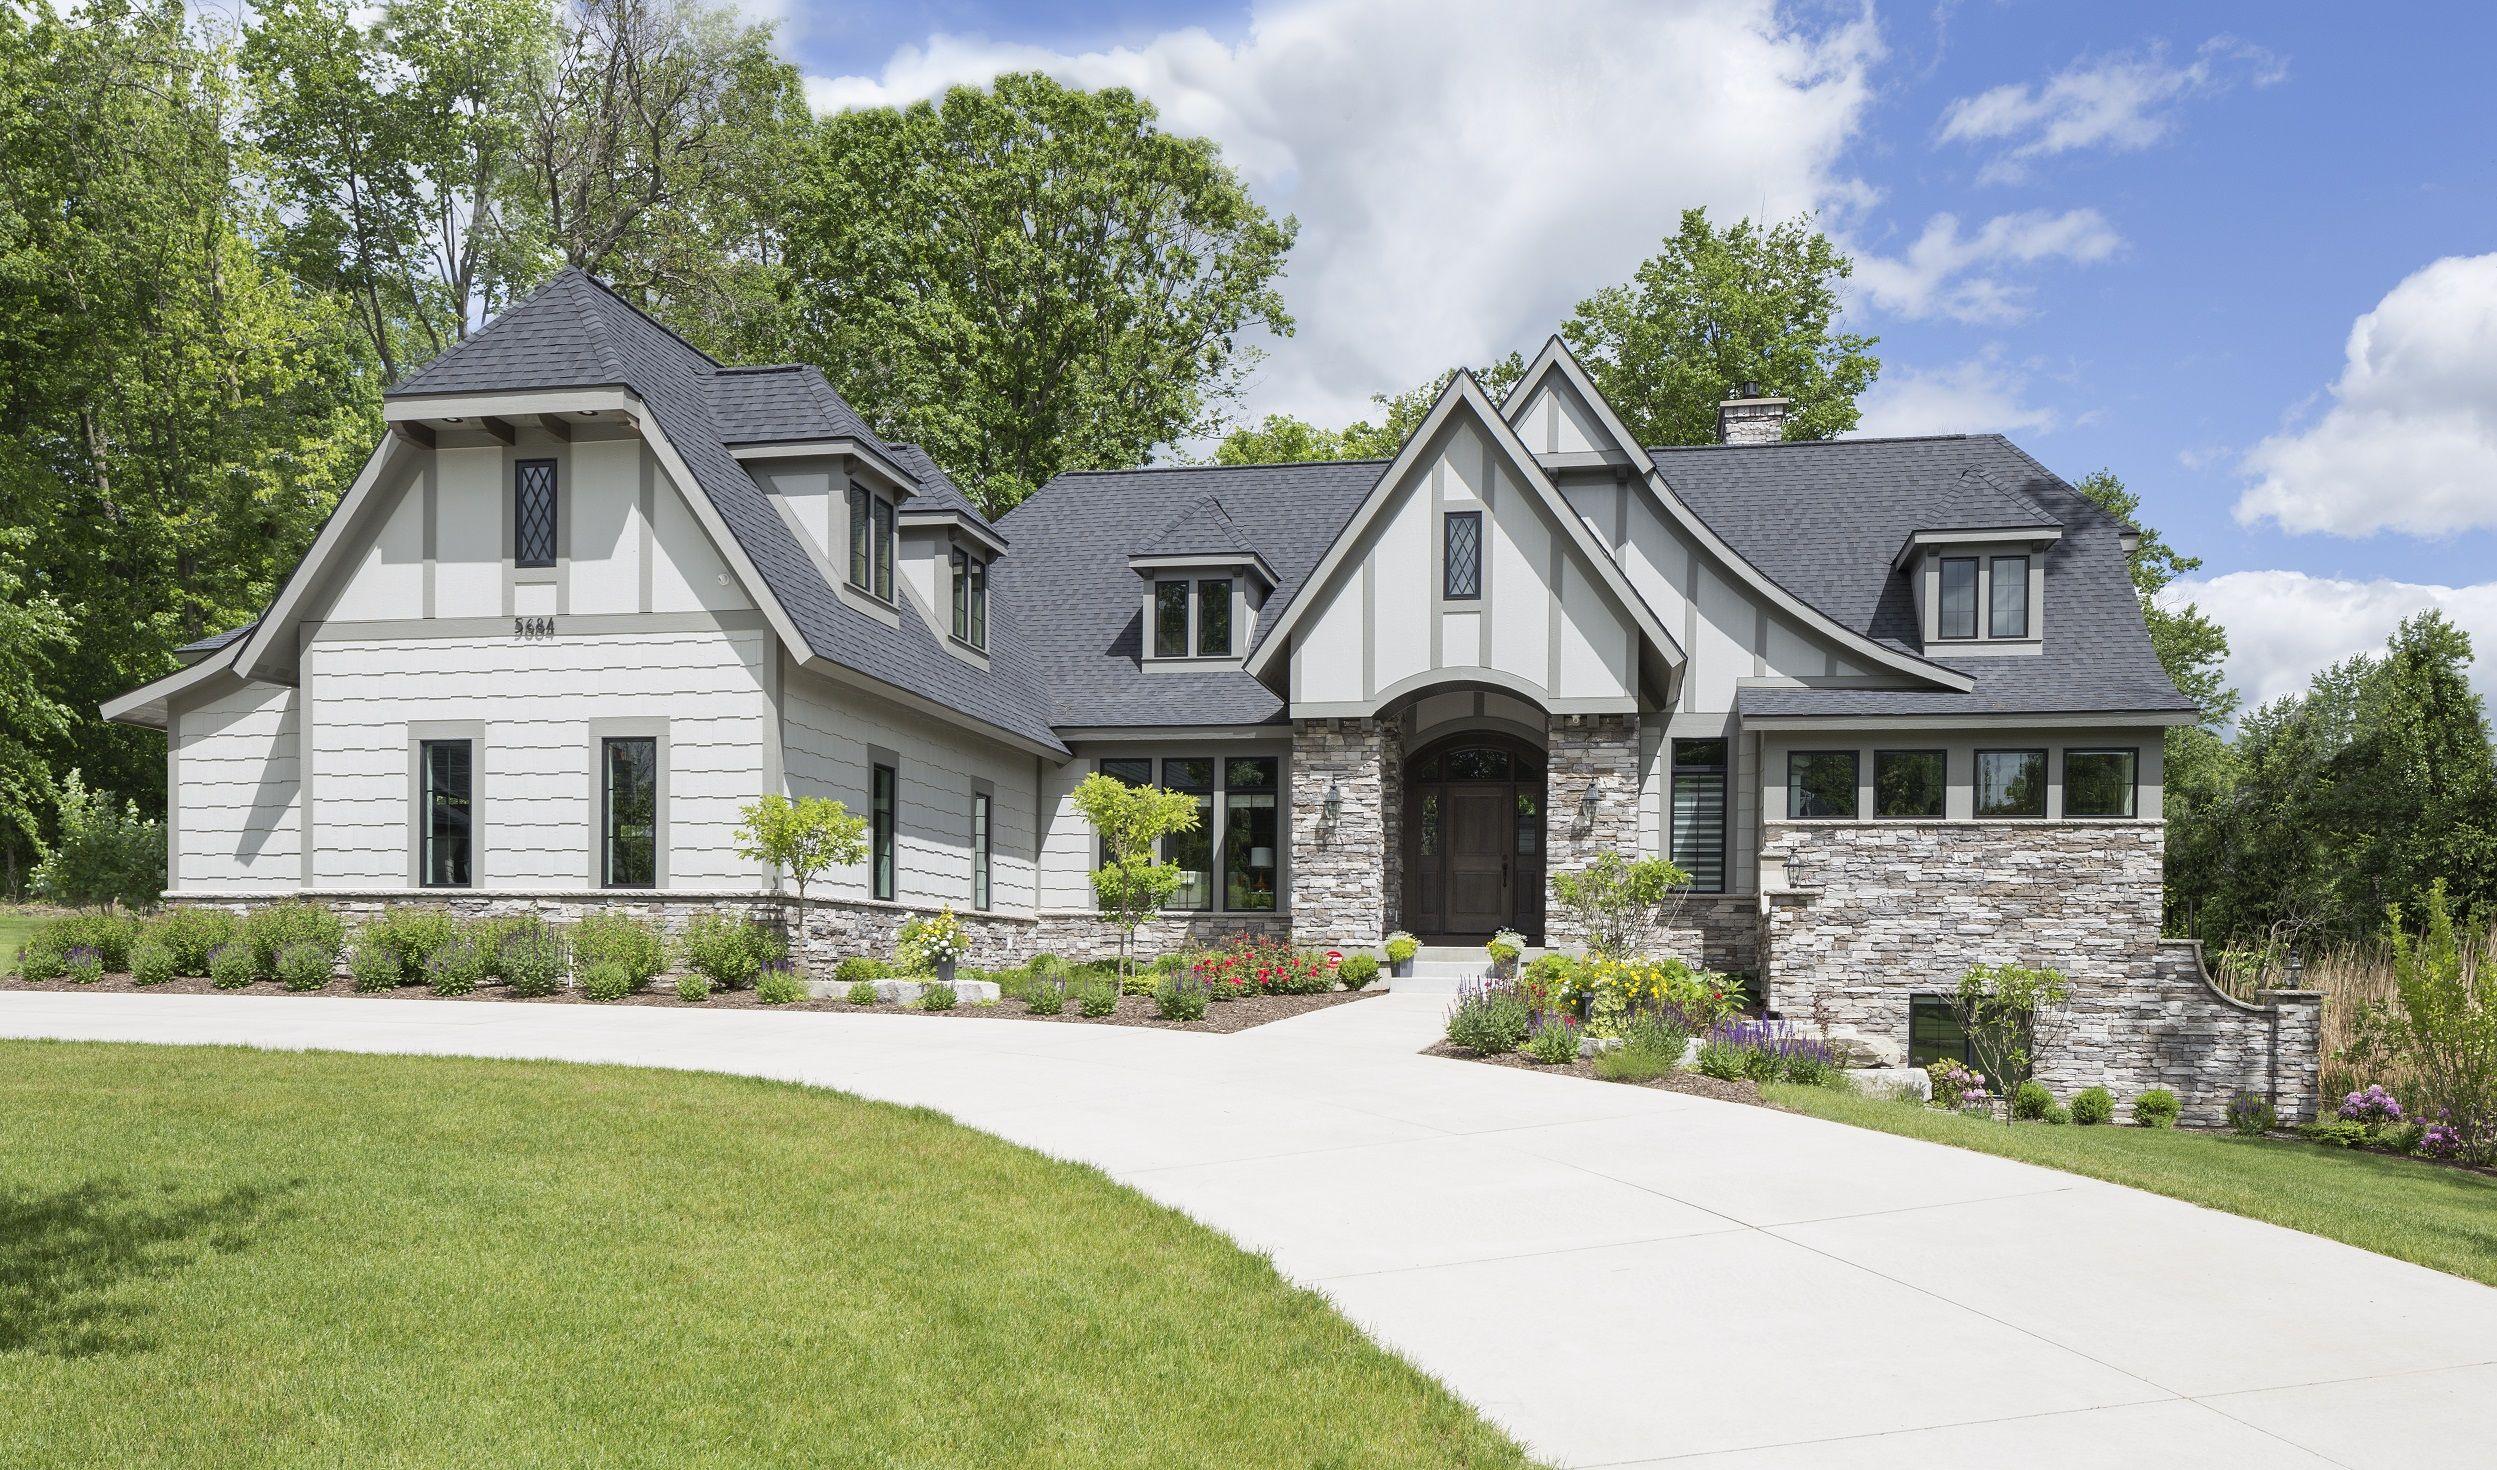 Tudor Style Residential Luxury House Plan - 5 Bedroom 35